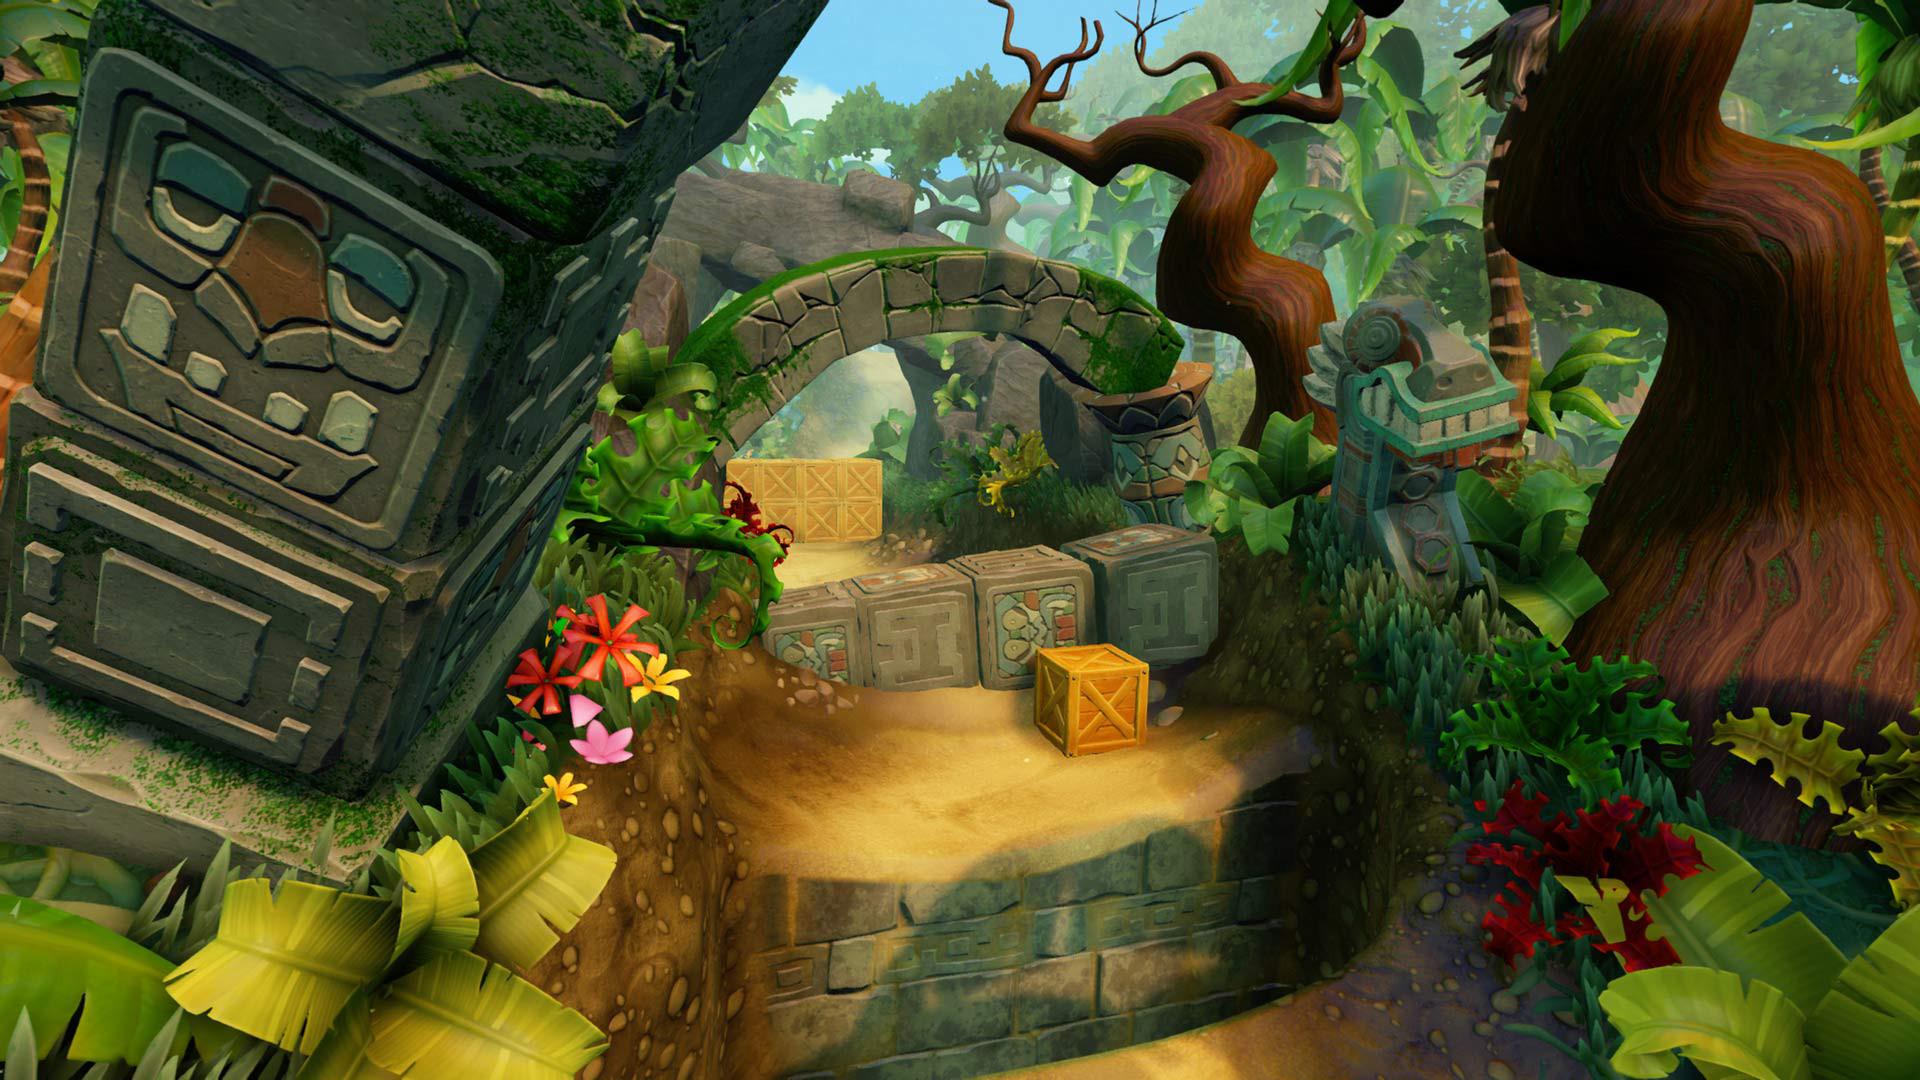 Crash Bandicoot N. Sane Trilogy PC chiave a buon mercato per il download